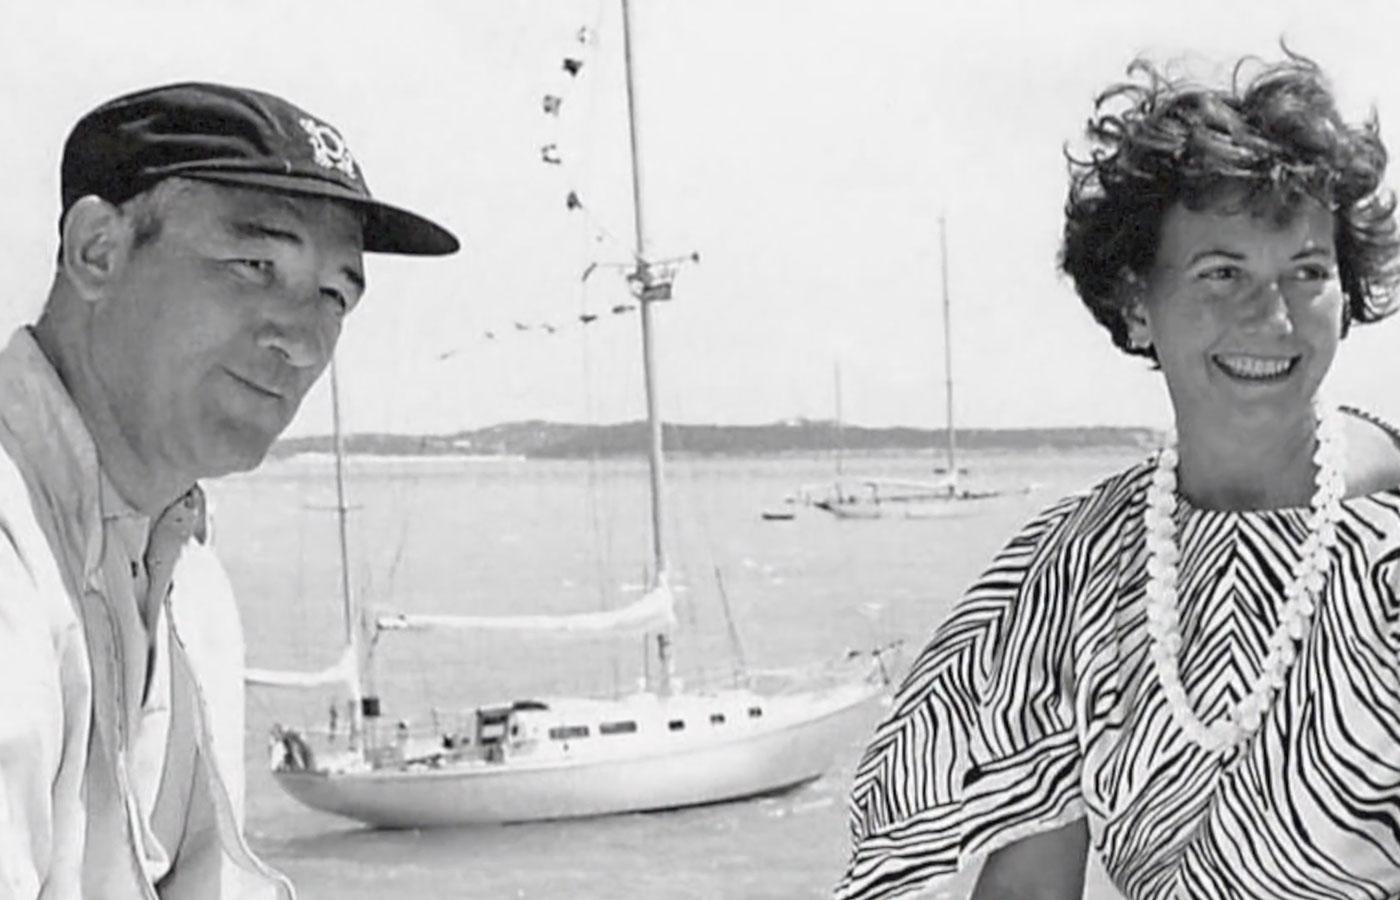 History Fort Lauderdale Honors Frank + Gertrude Denison